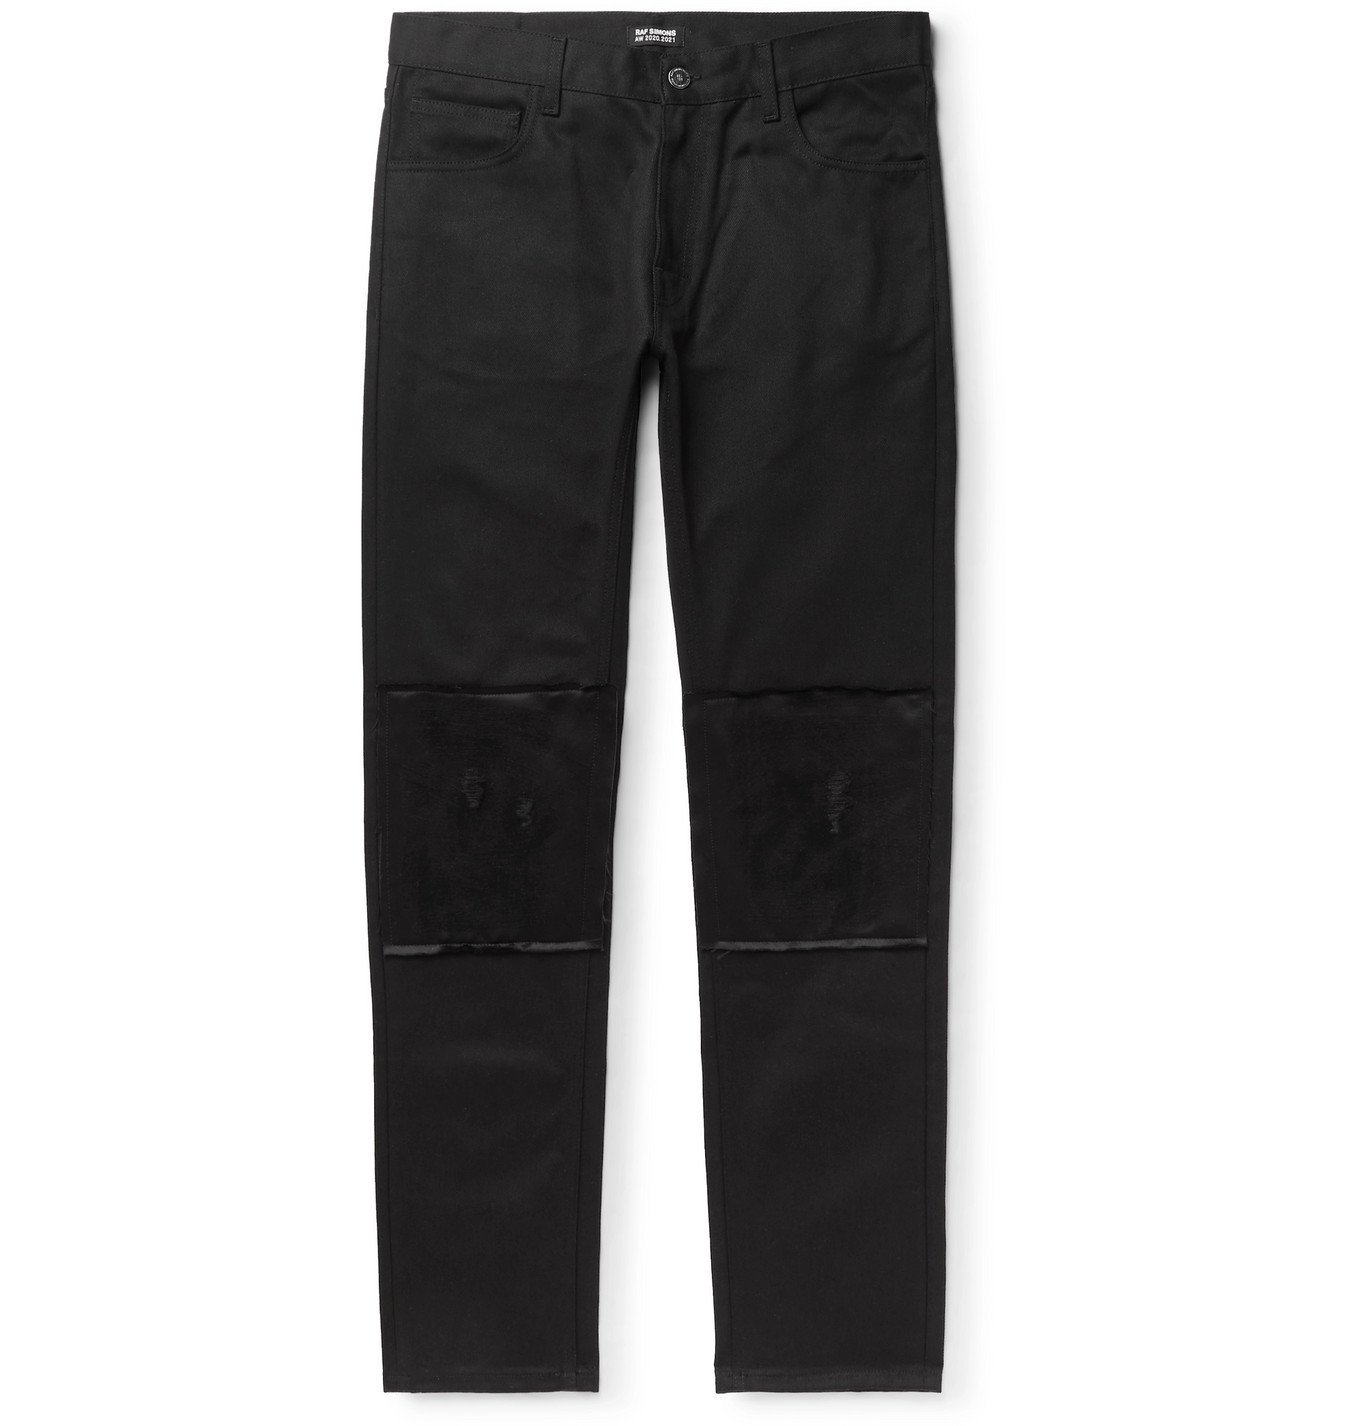 Raf Simons - Slim-Fit Distressed Satin-Trimmed Denim Jeans - Black